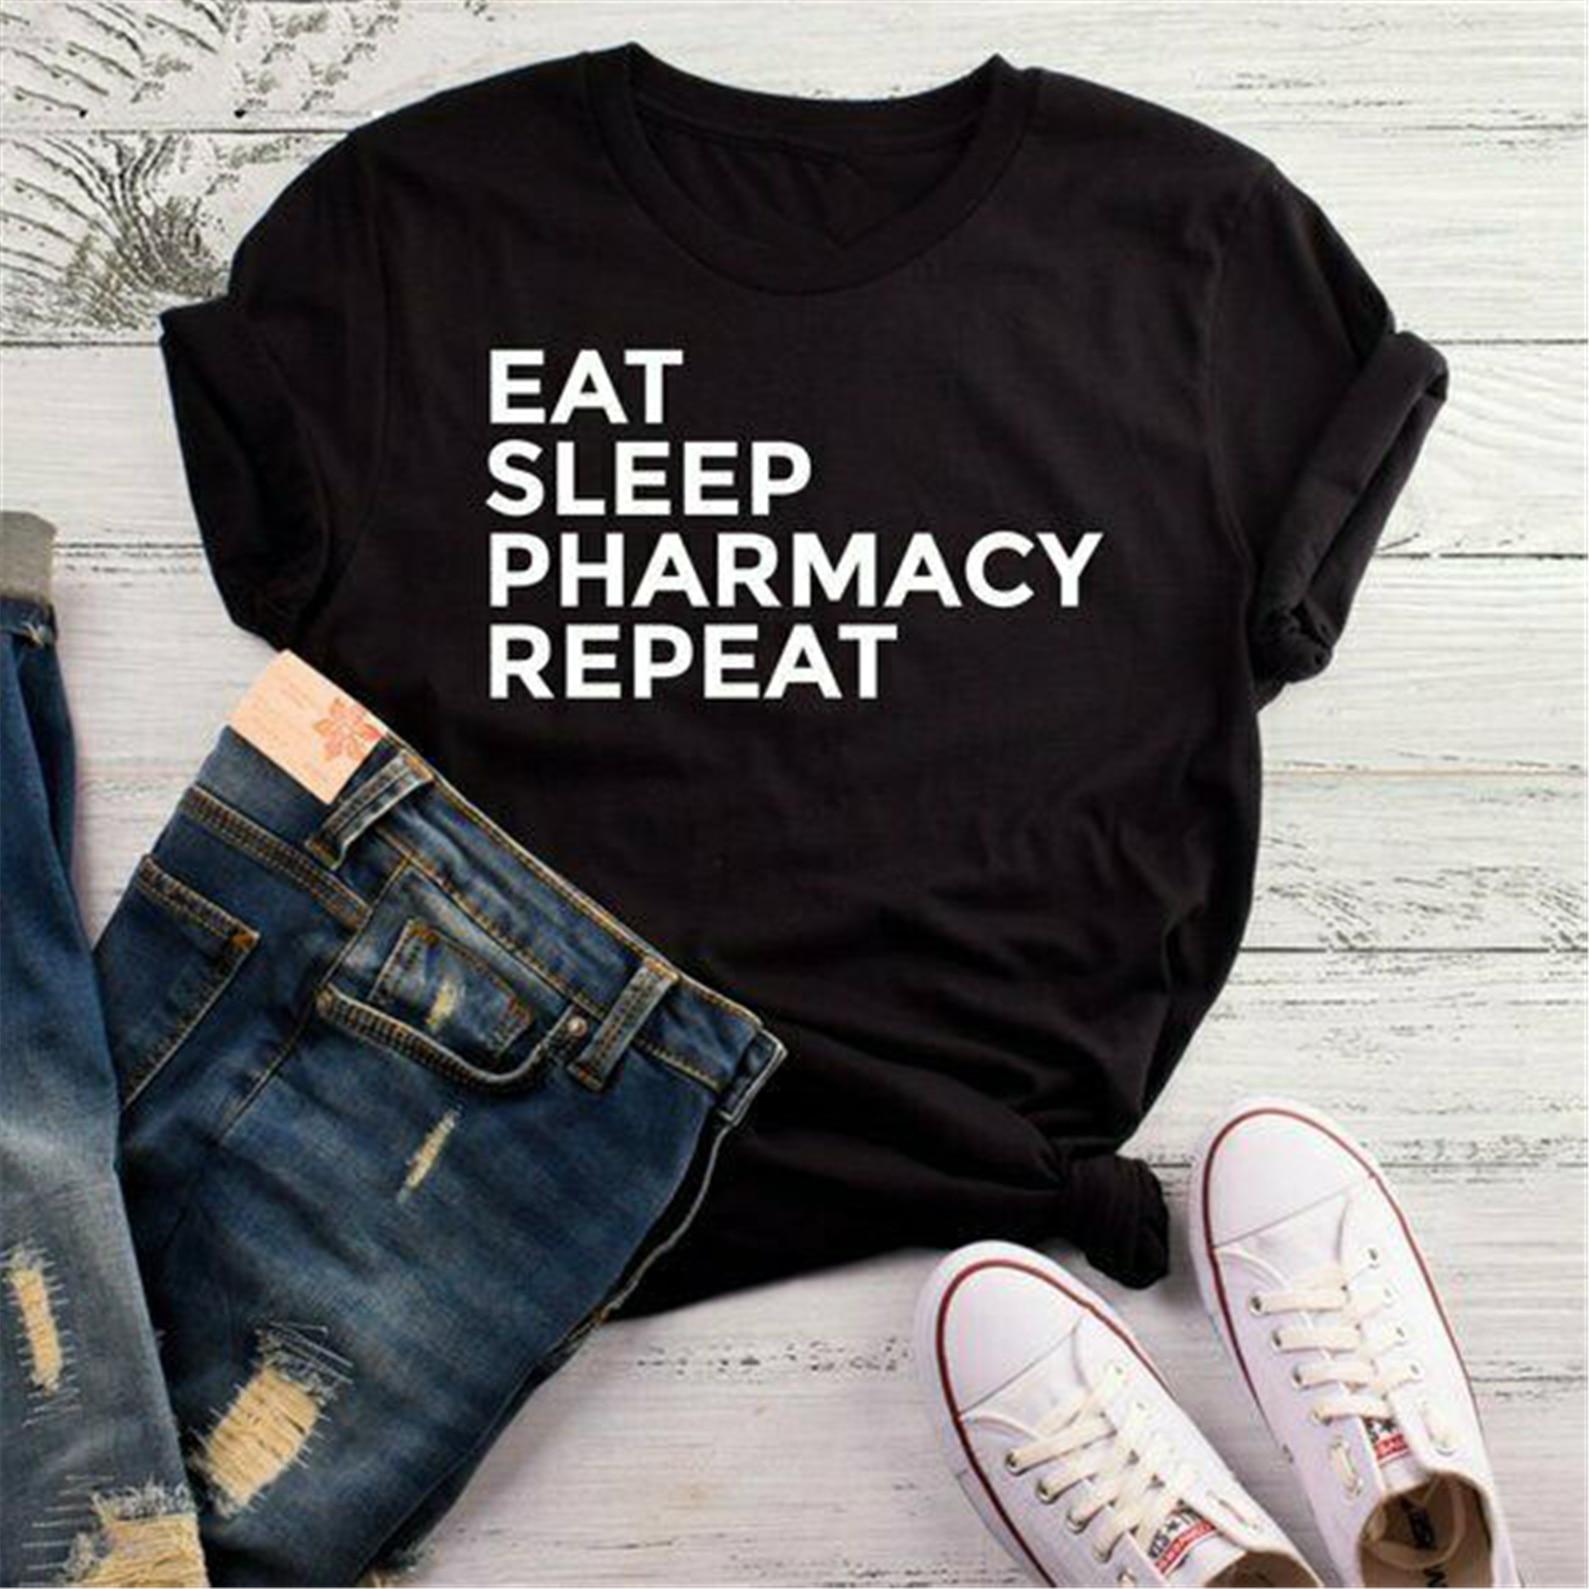 Camiseta Eat Sleep Pharmacy Repeat, camiseta farmacéutica, camisetas de regalo para farmacéutico, camiseta Popular